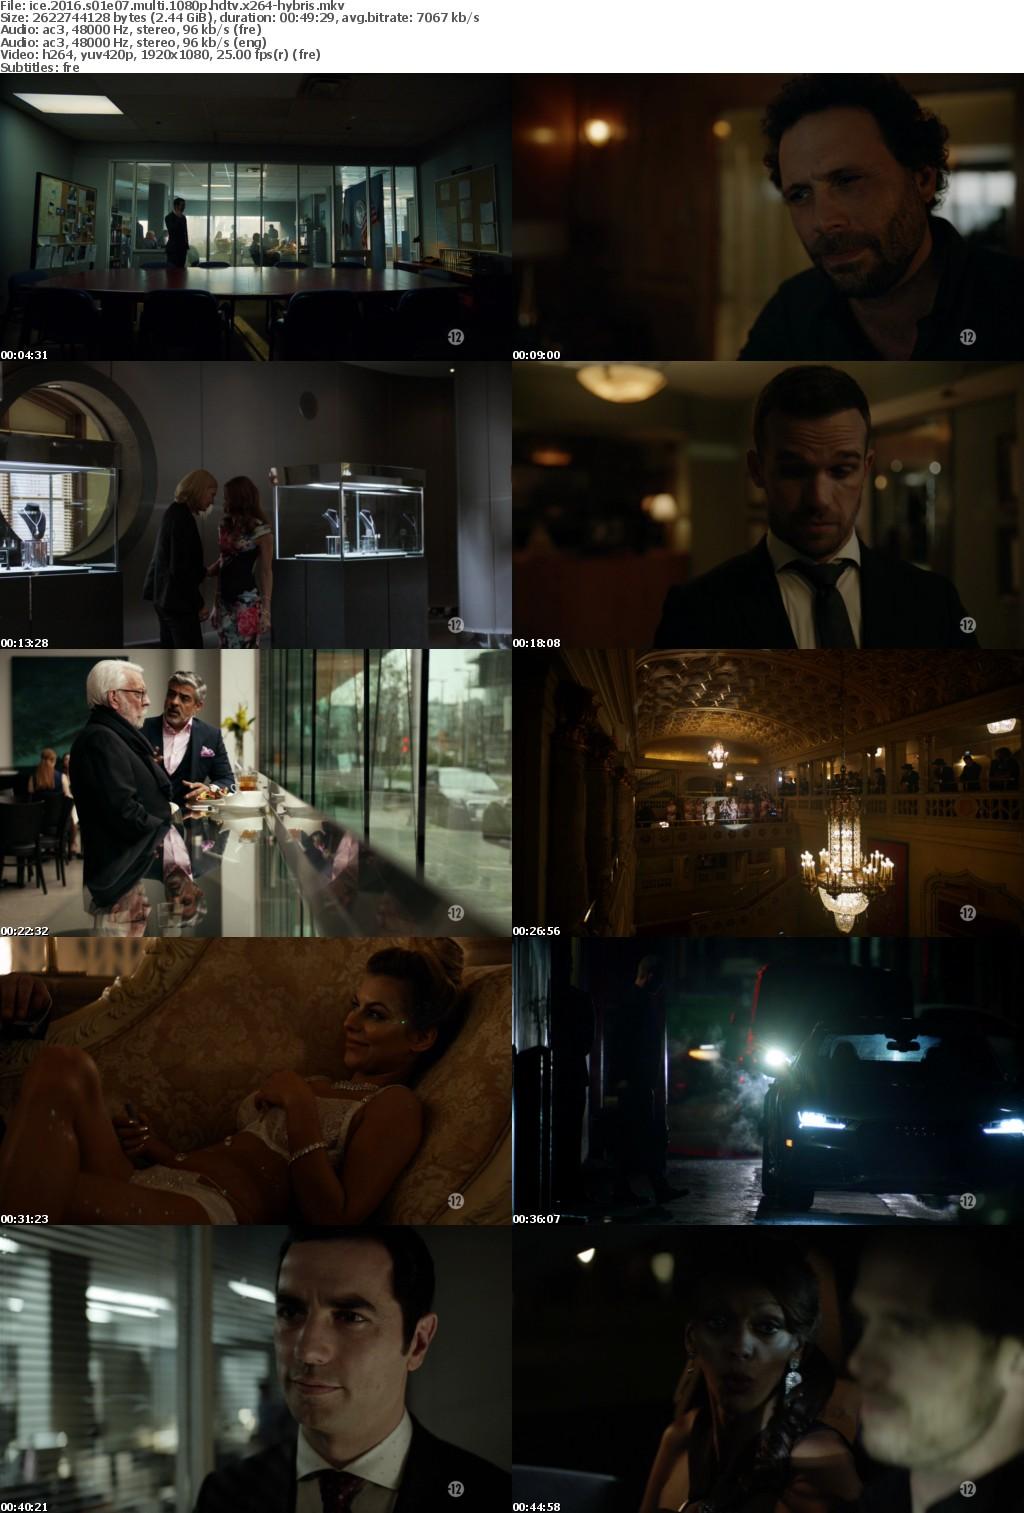 Ice 2016 S01E07 MULTi 1080p HDTV x264-HYBRiS